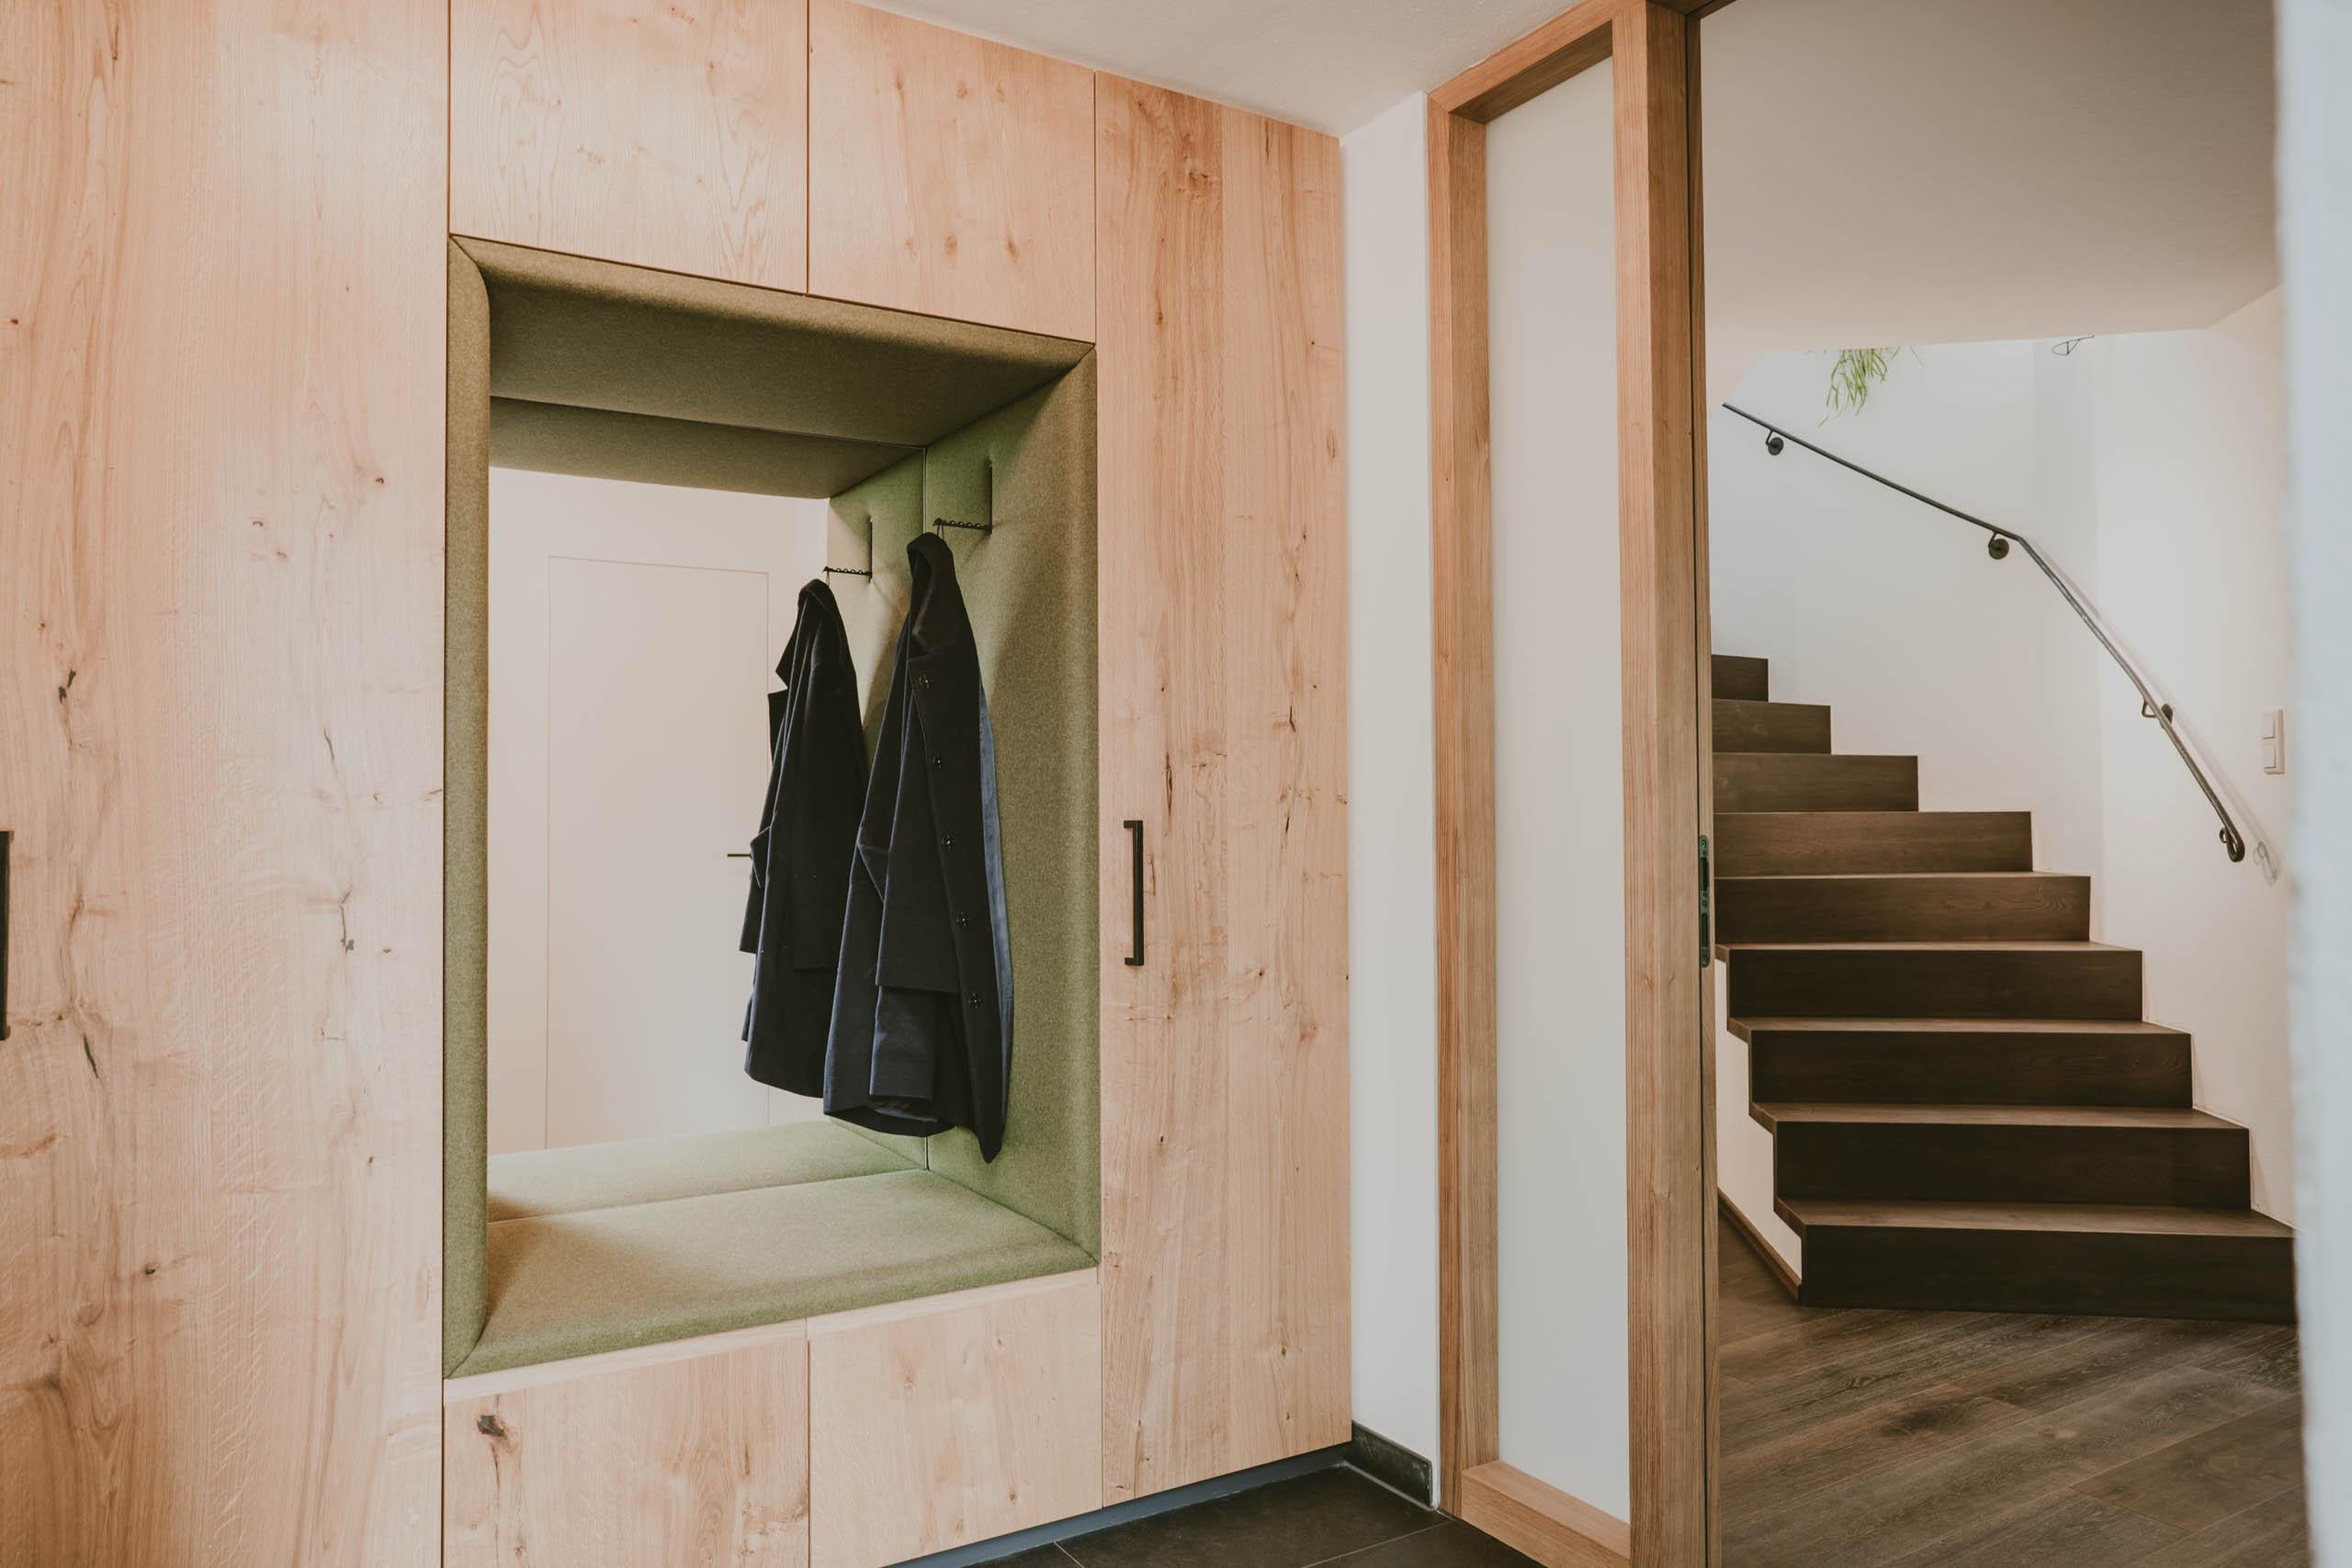 20210521 paula buchner innenarchitektur haus im chiemgau by andreamittermeier 9AM06391